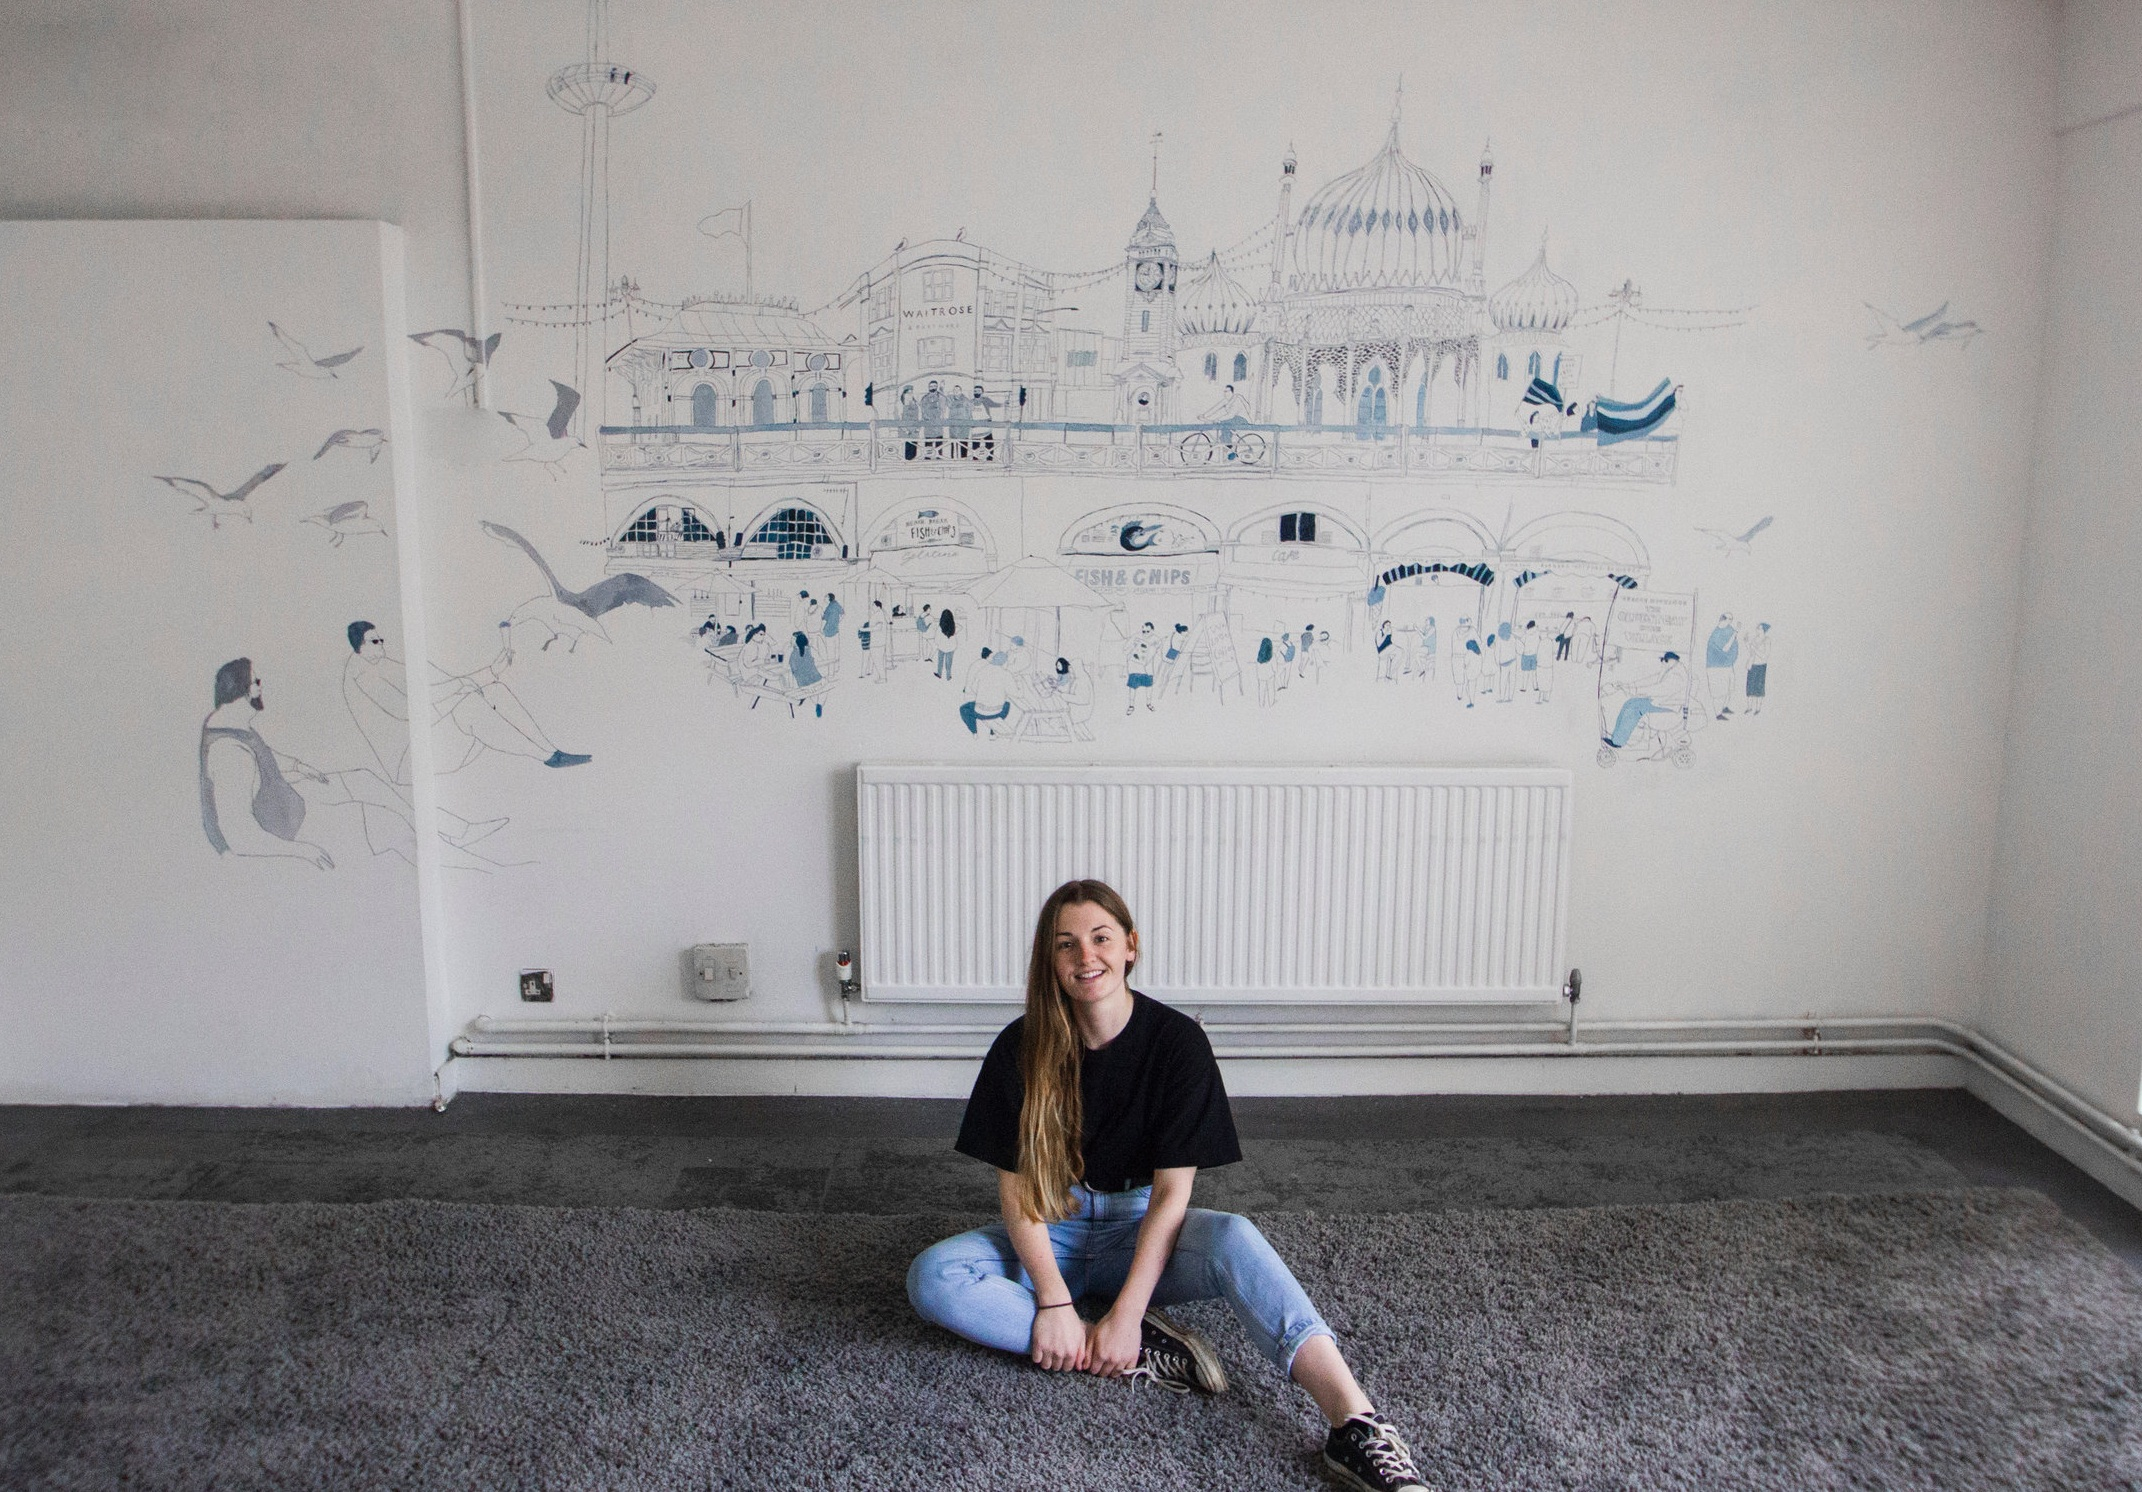 Waitrose & Partners mural